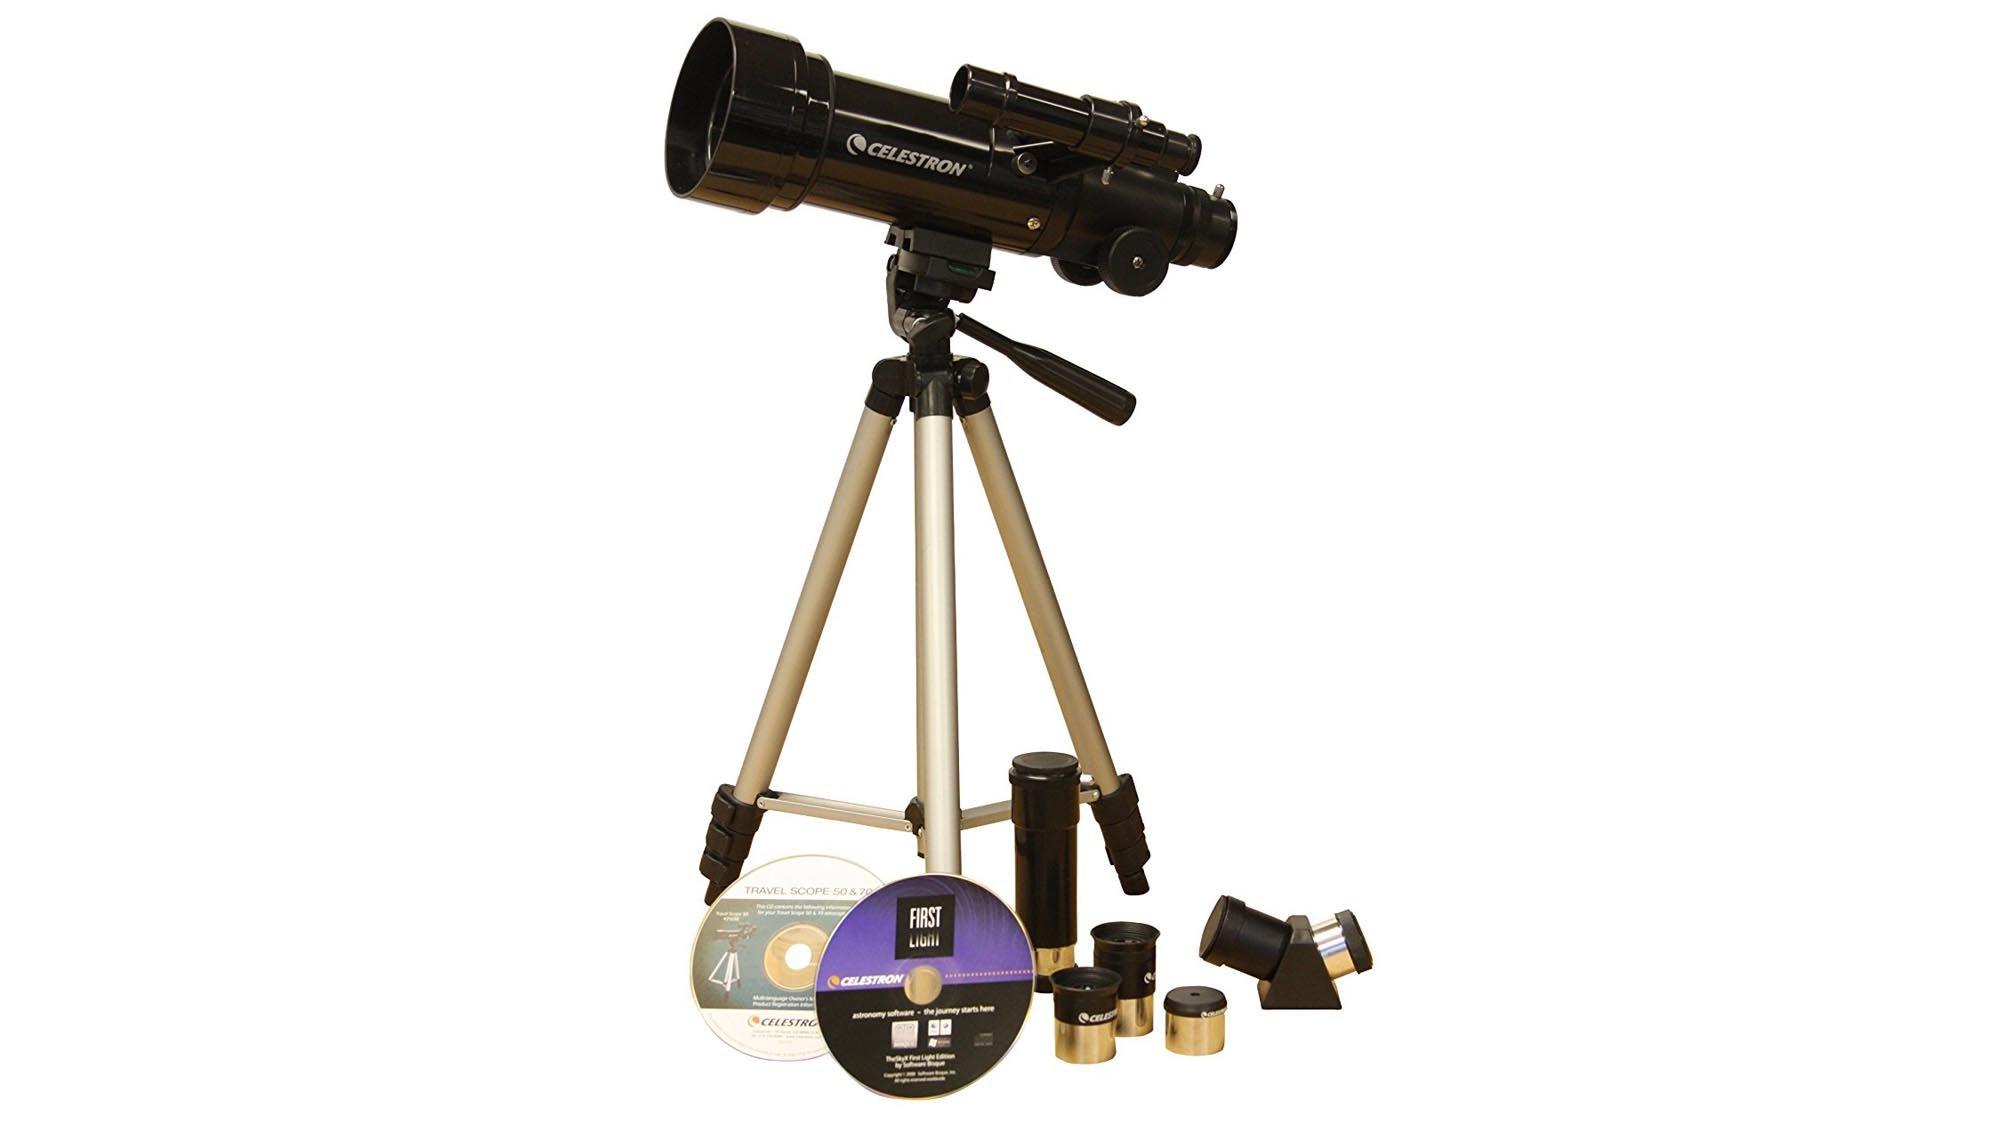 Teleskop celestron travelscope reiseteleskop mit praktis